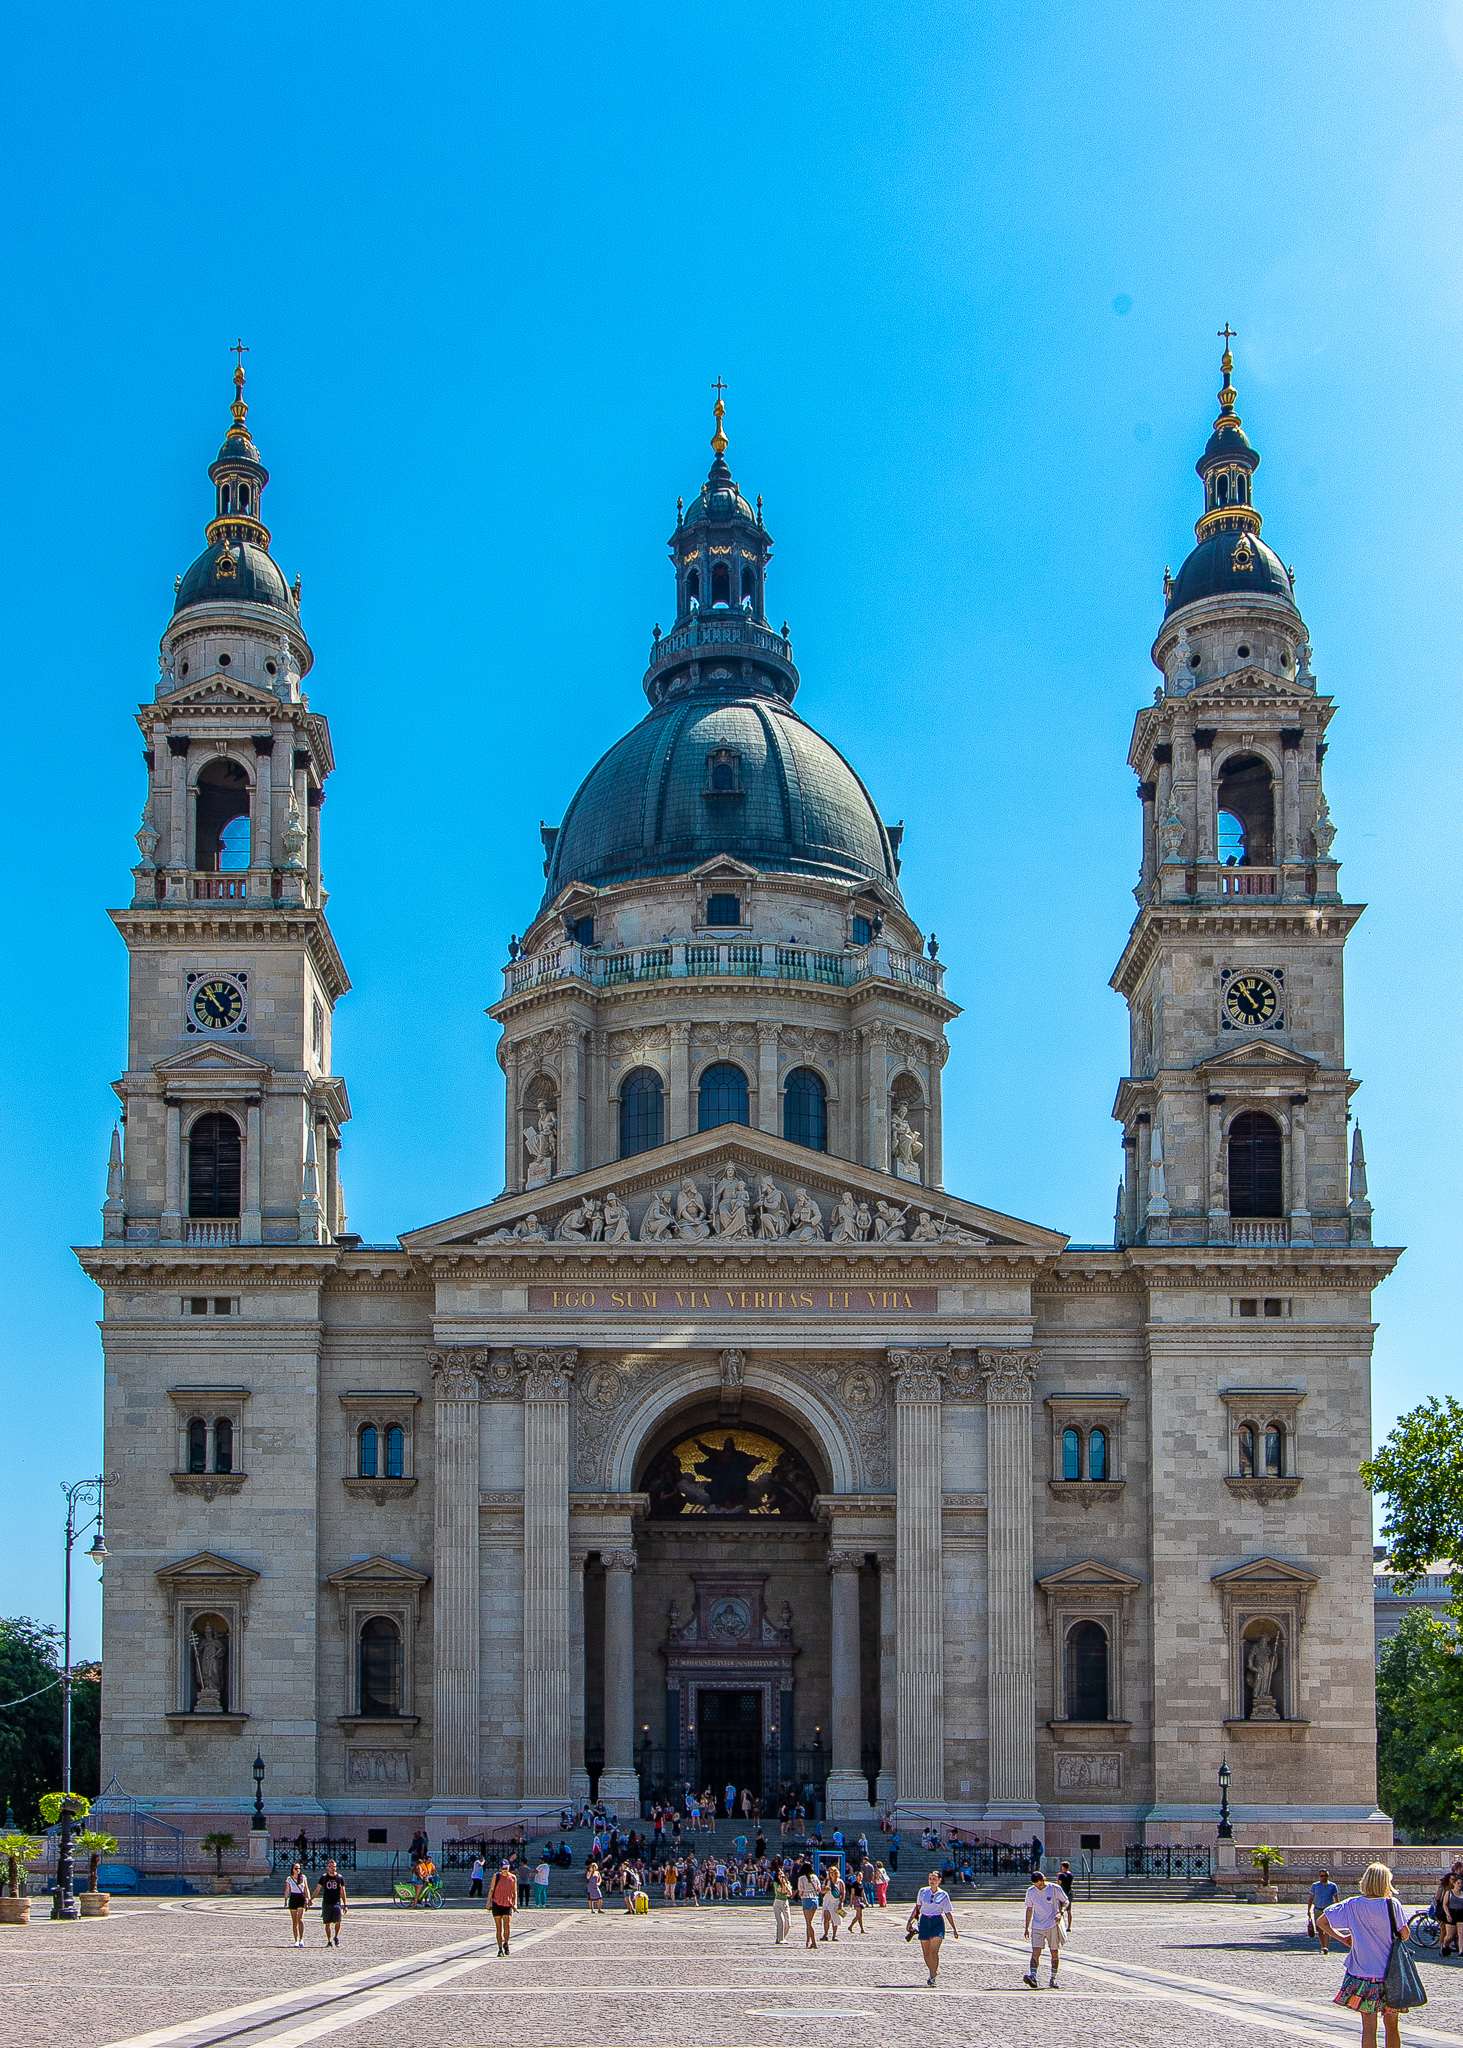 The fabulous facade of St Stephens Basilica